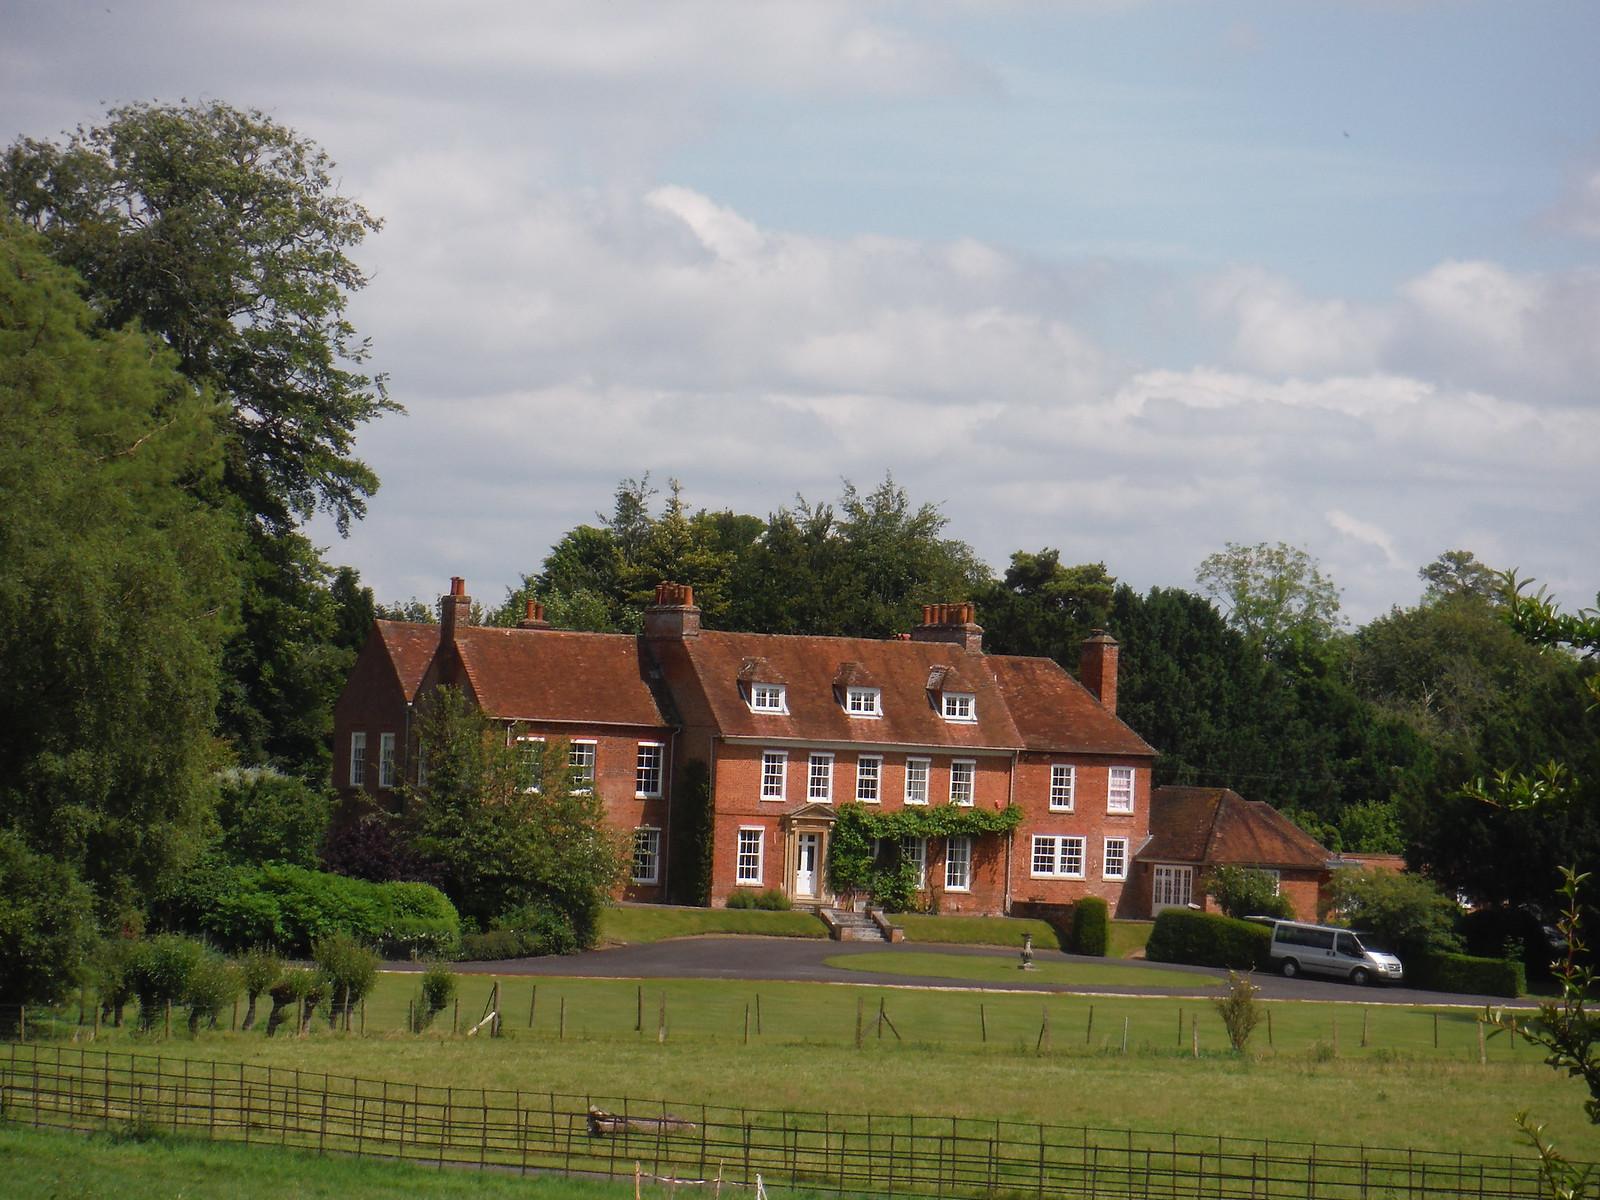 Broughton House SWC Walk 265 - Dean to Mottisfont & Dunbridge